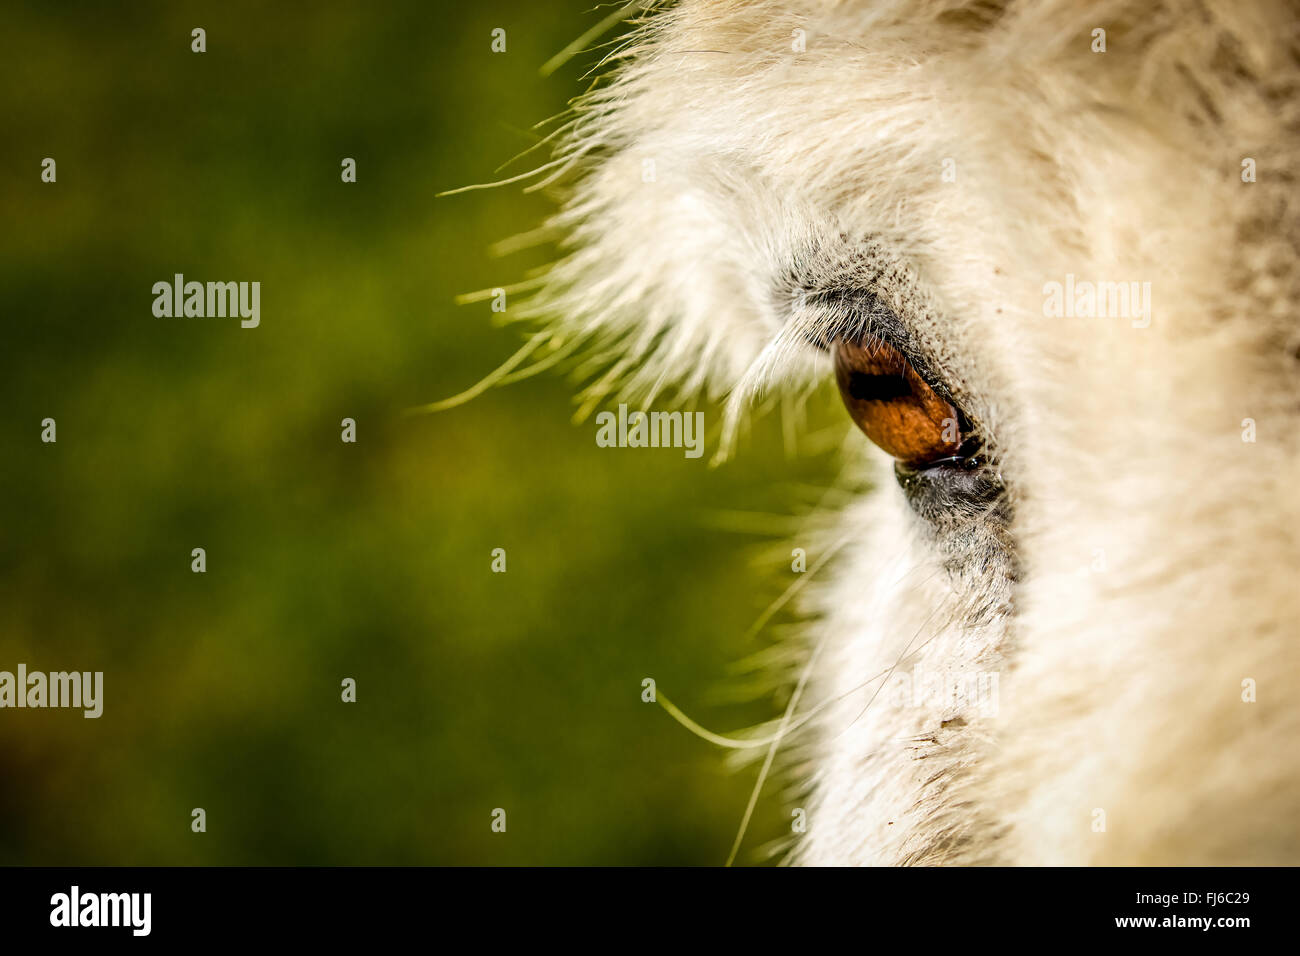 Close-up de donkey's eye Imagen De Stock